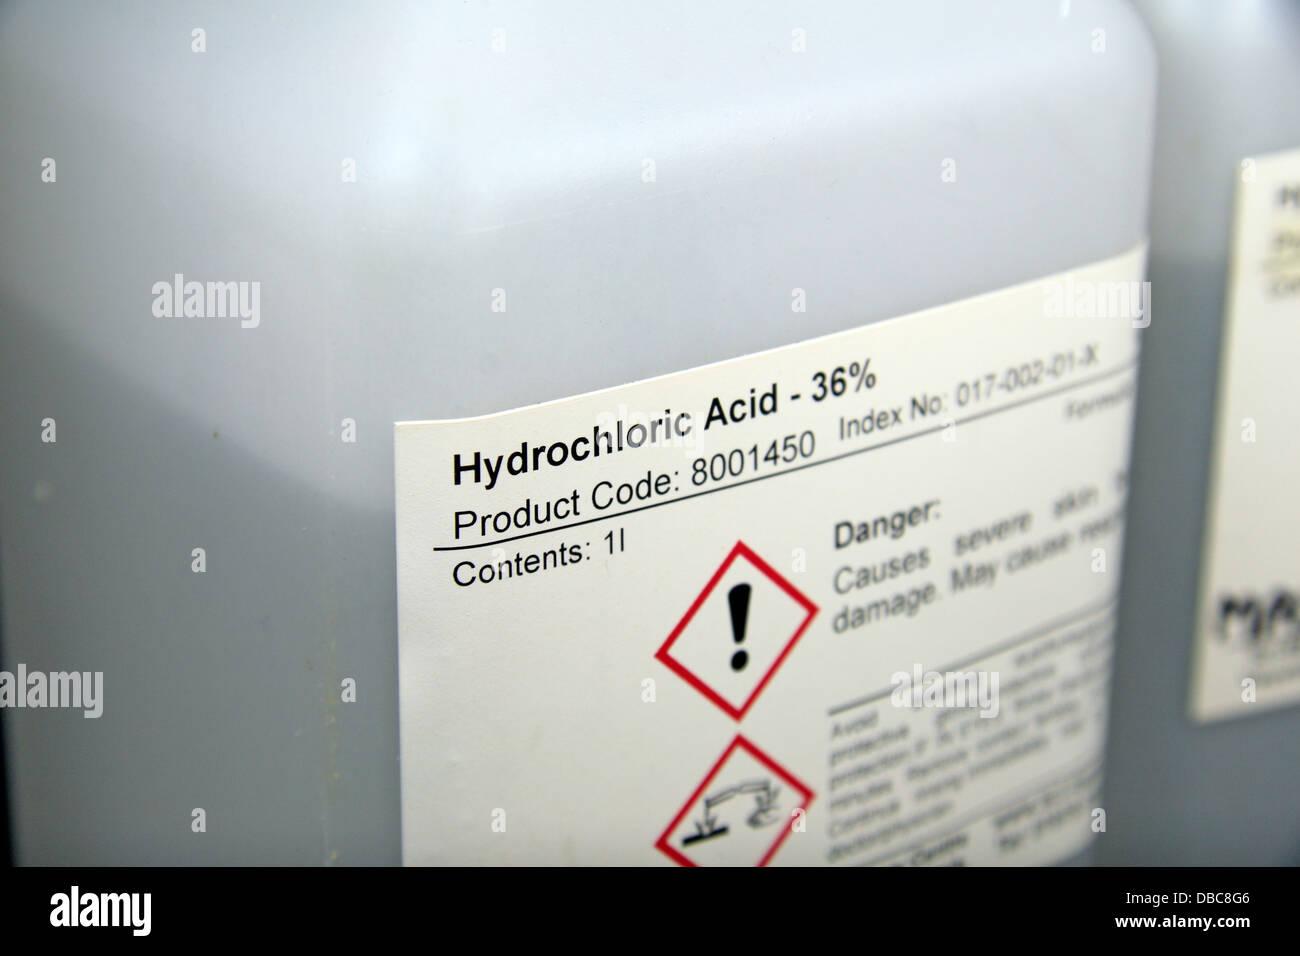 Hydrochloric Acid Stock Photos Hydrochloric Acid Stock Images Alamy